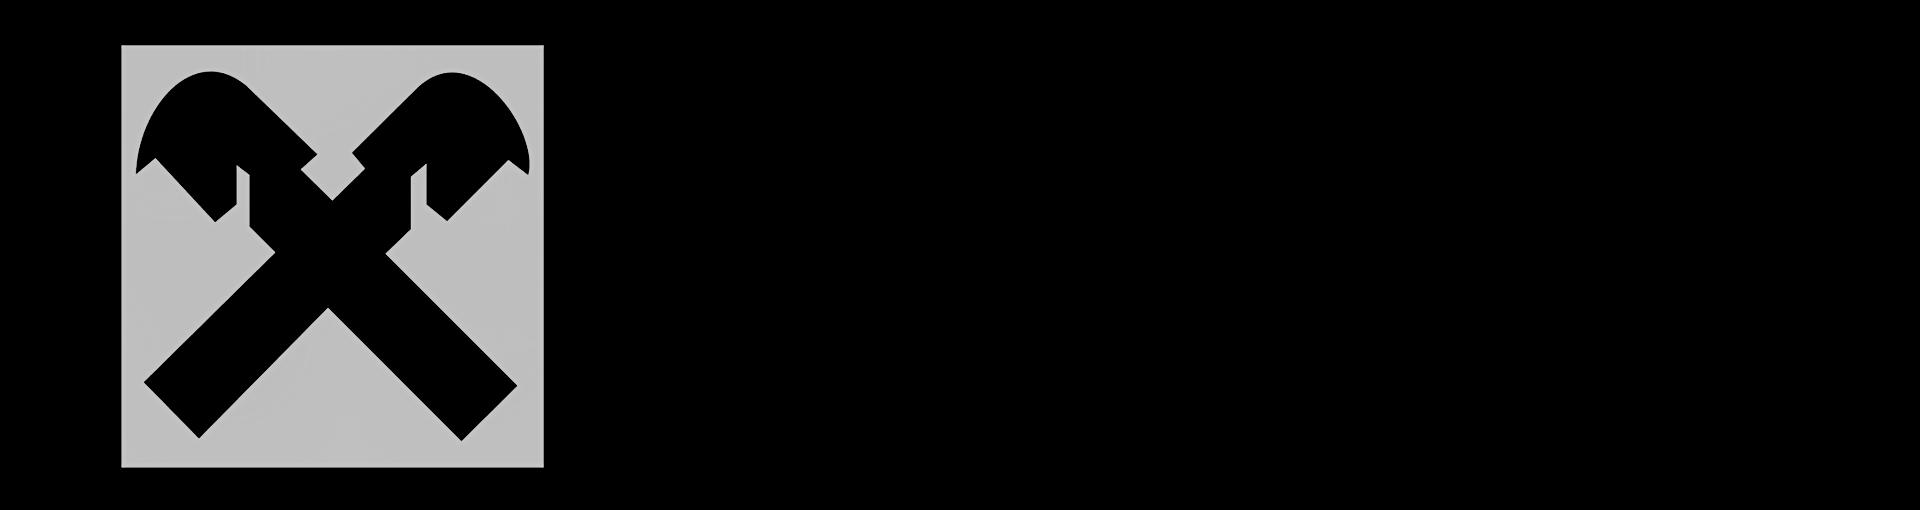 Raiffeisen-Bank-International-logo-BW (1)